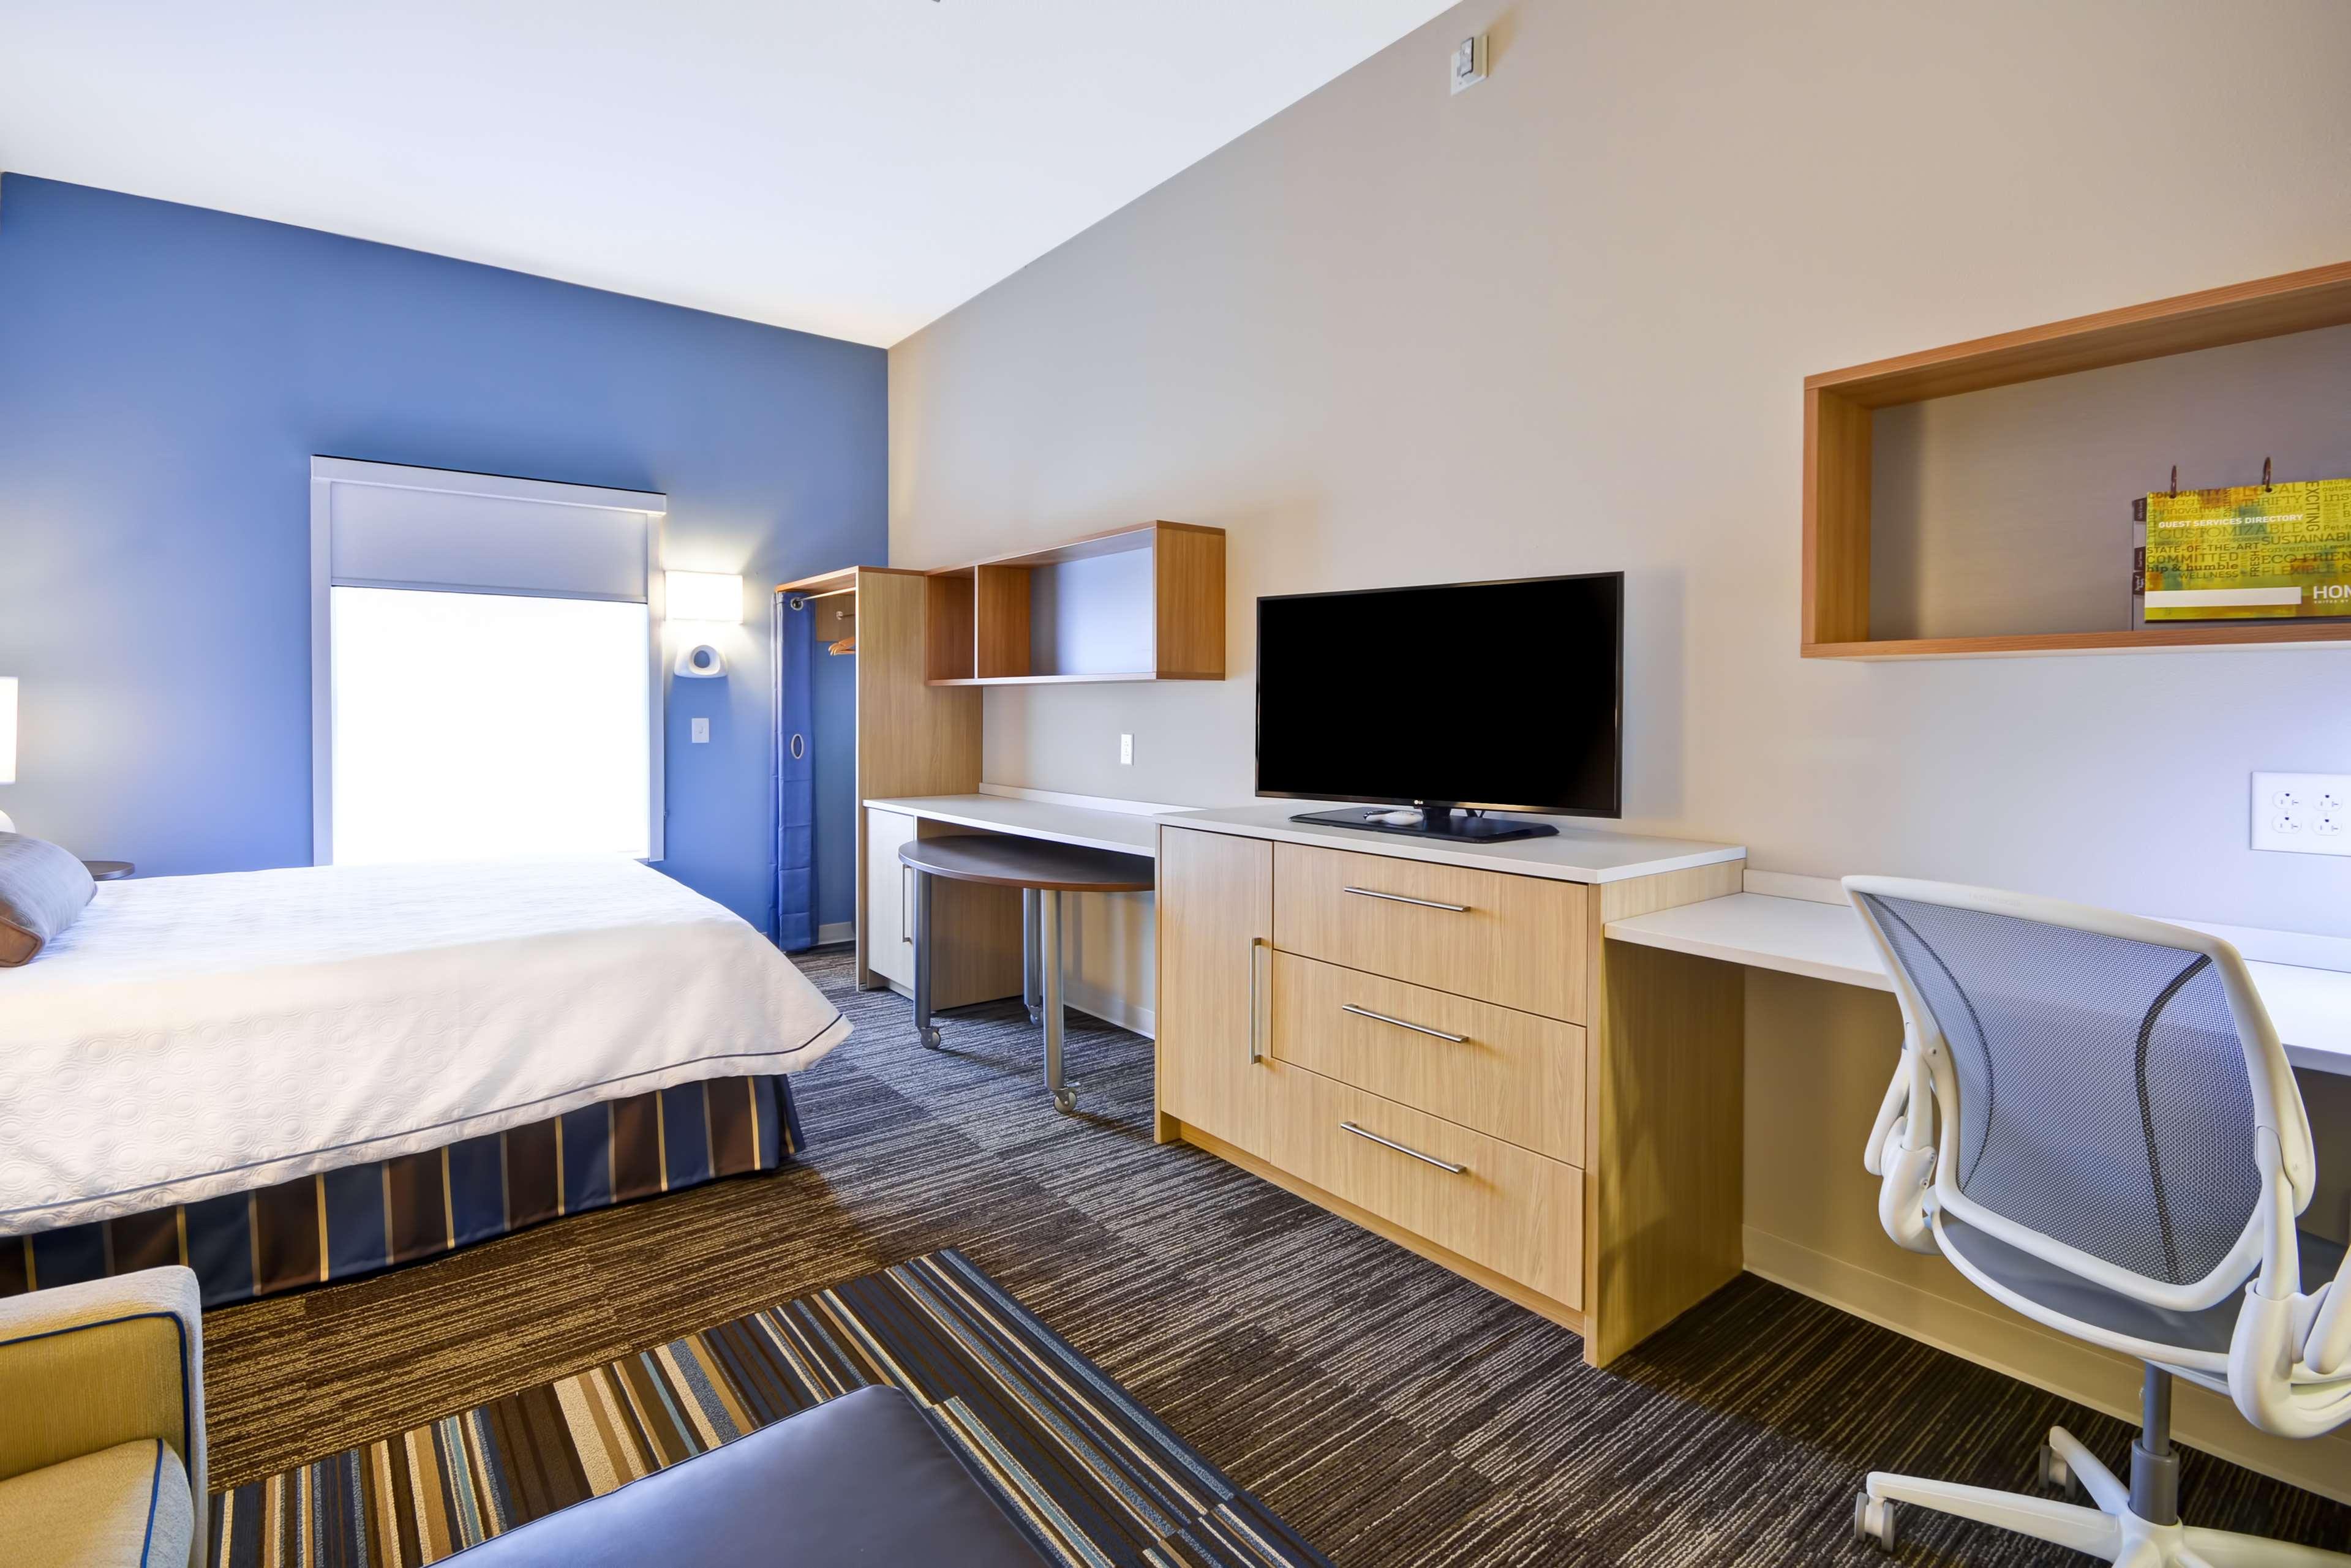 Home2 Suites by Hilton  St. Simons Island image 36